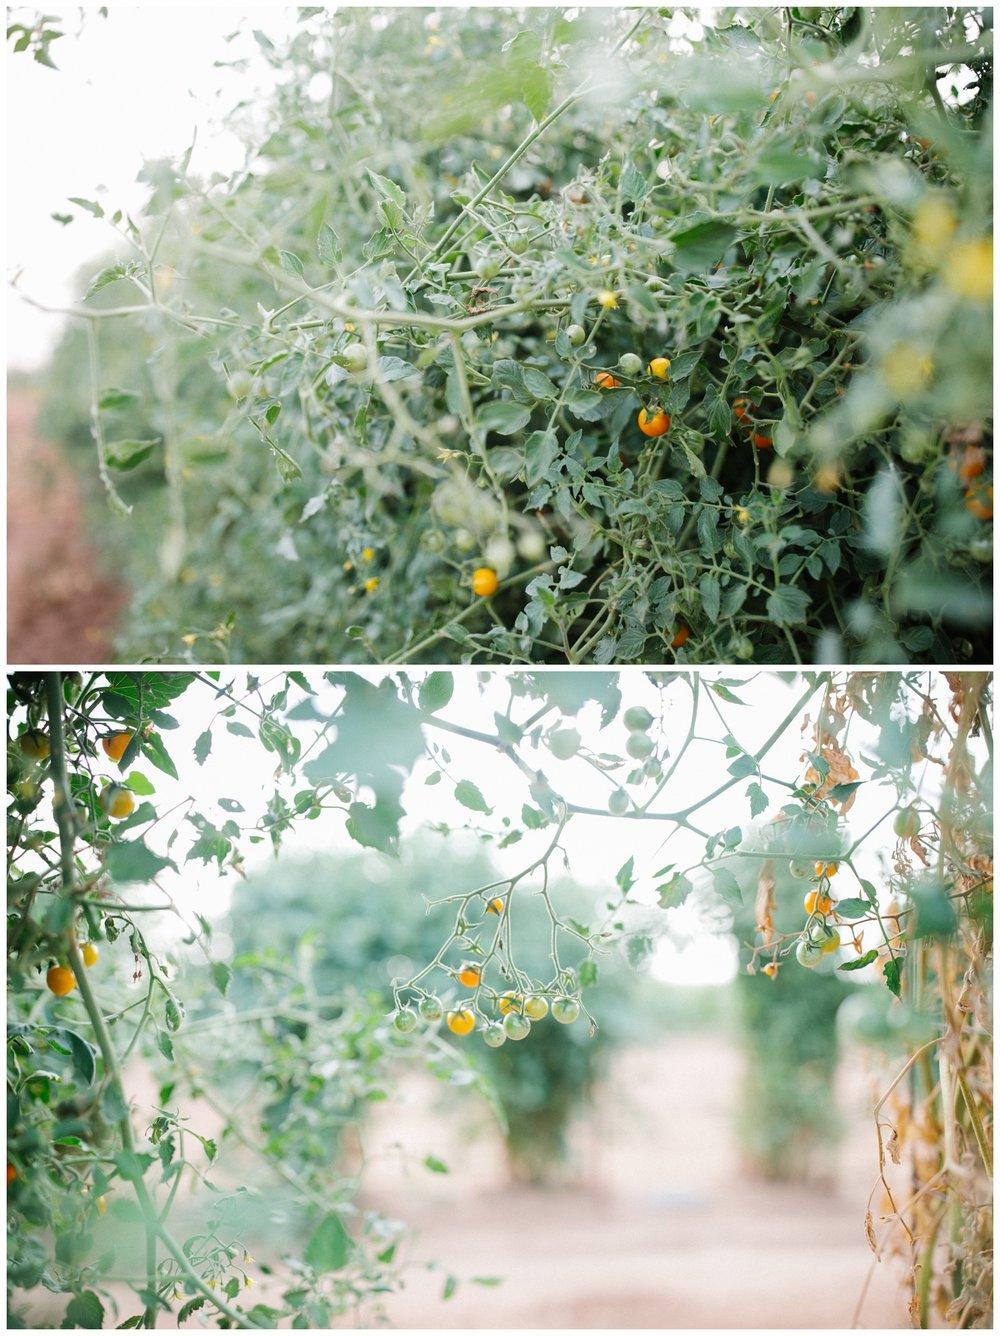 Reimer Farms__Lubbock Texas produce garden_29.jpg